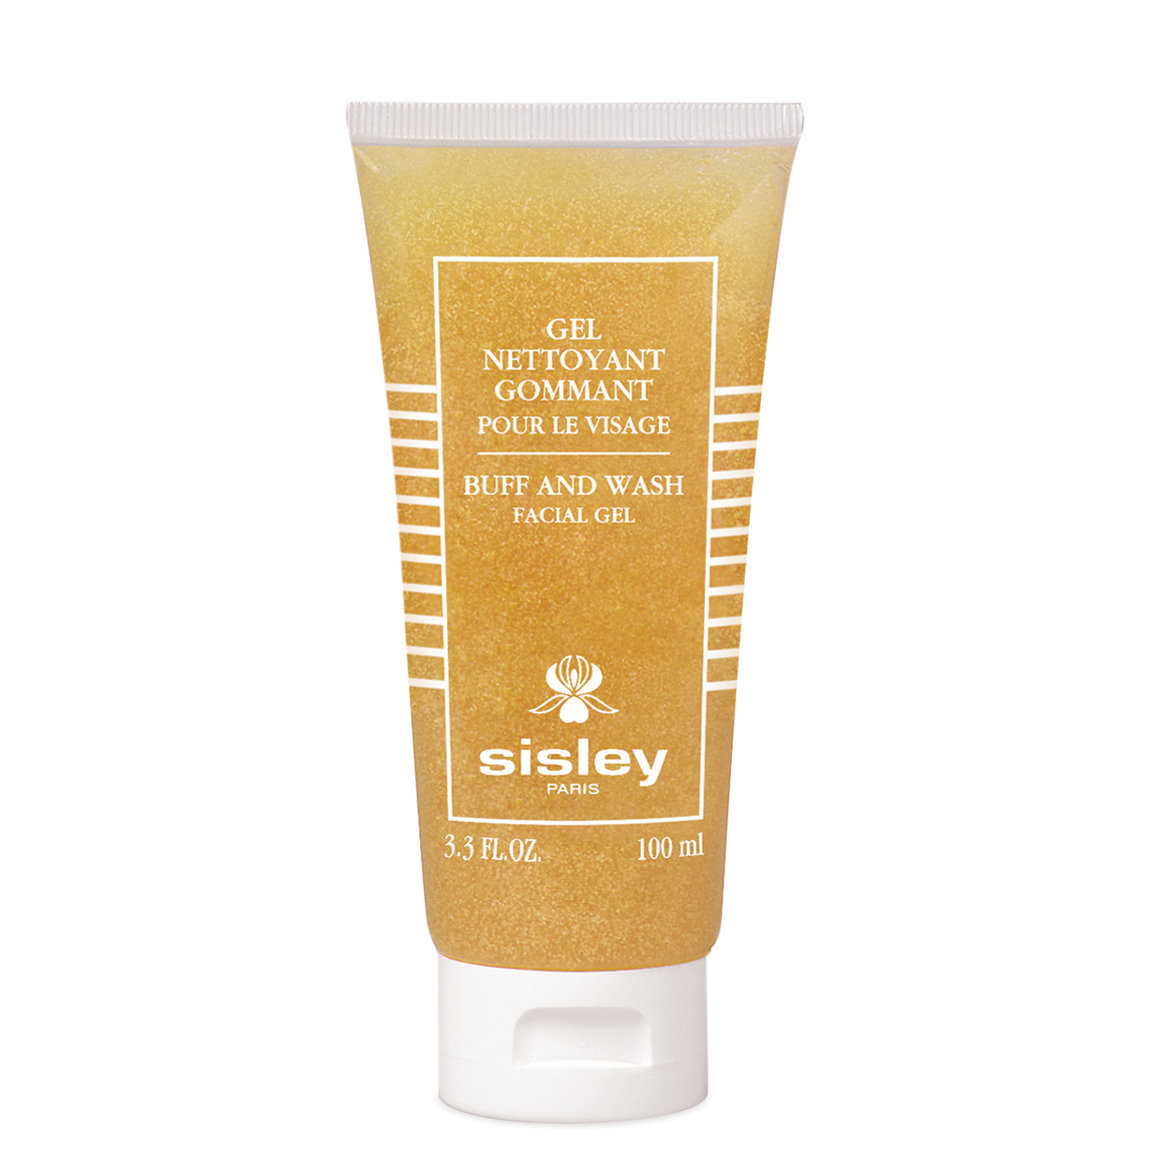 Sisley-Paris Buff & Wash Facial Gel alternative view 1 - product swatch.